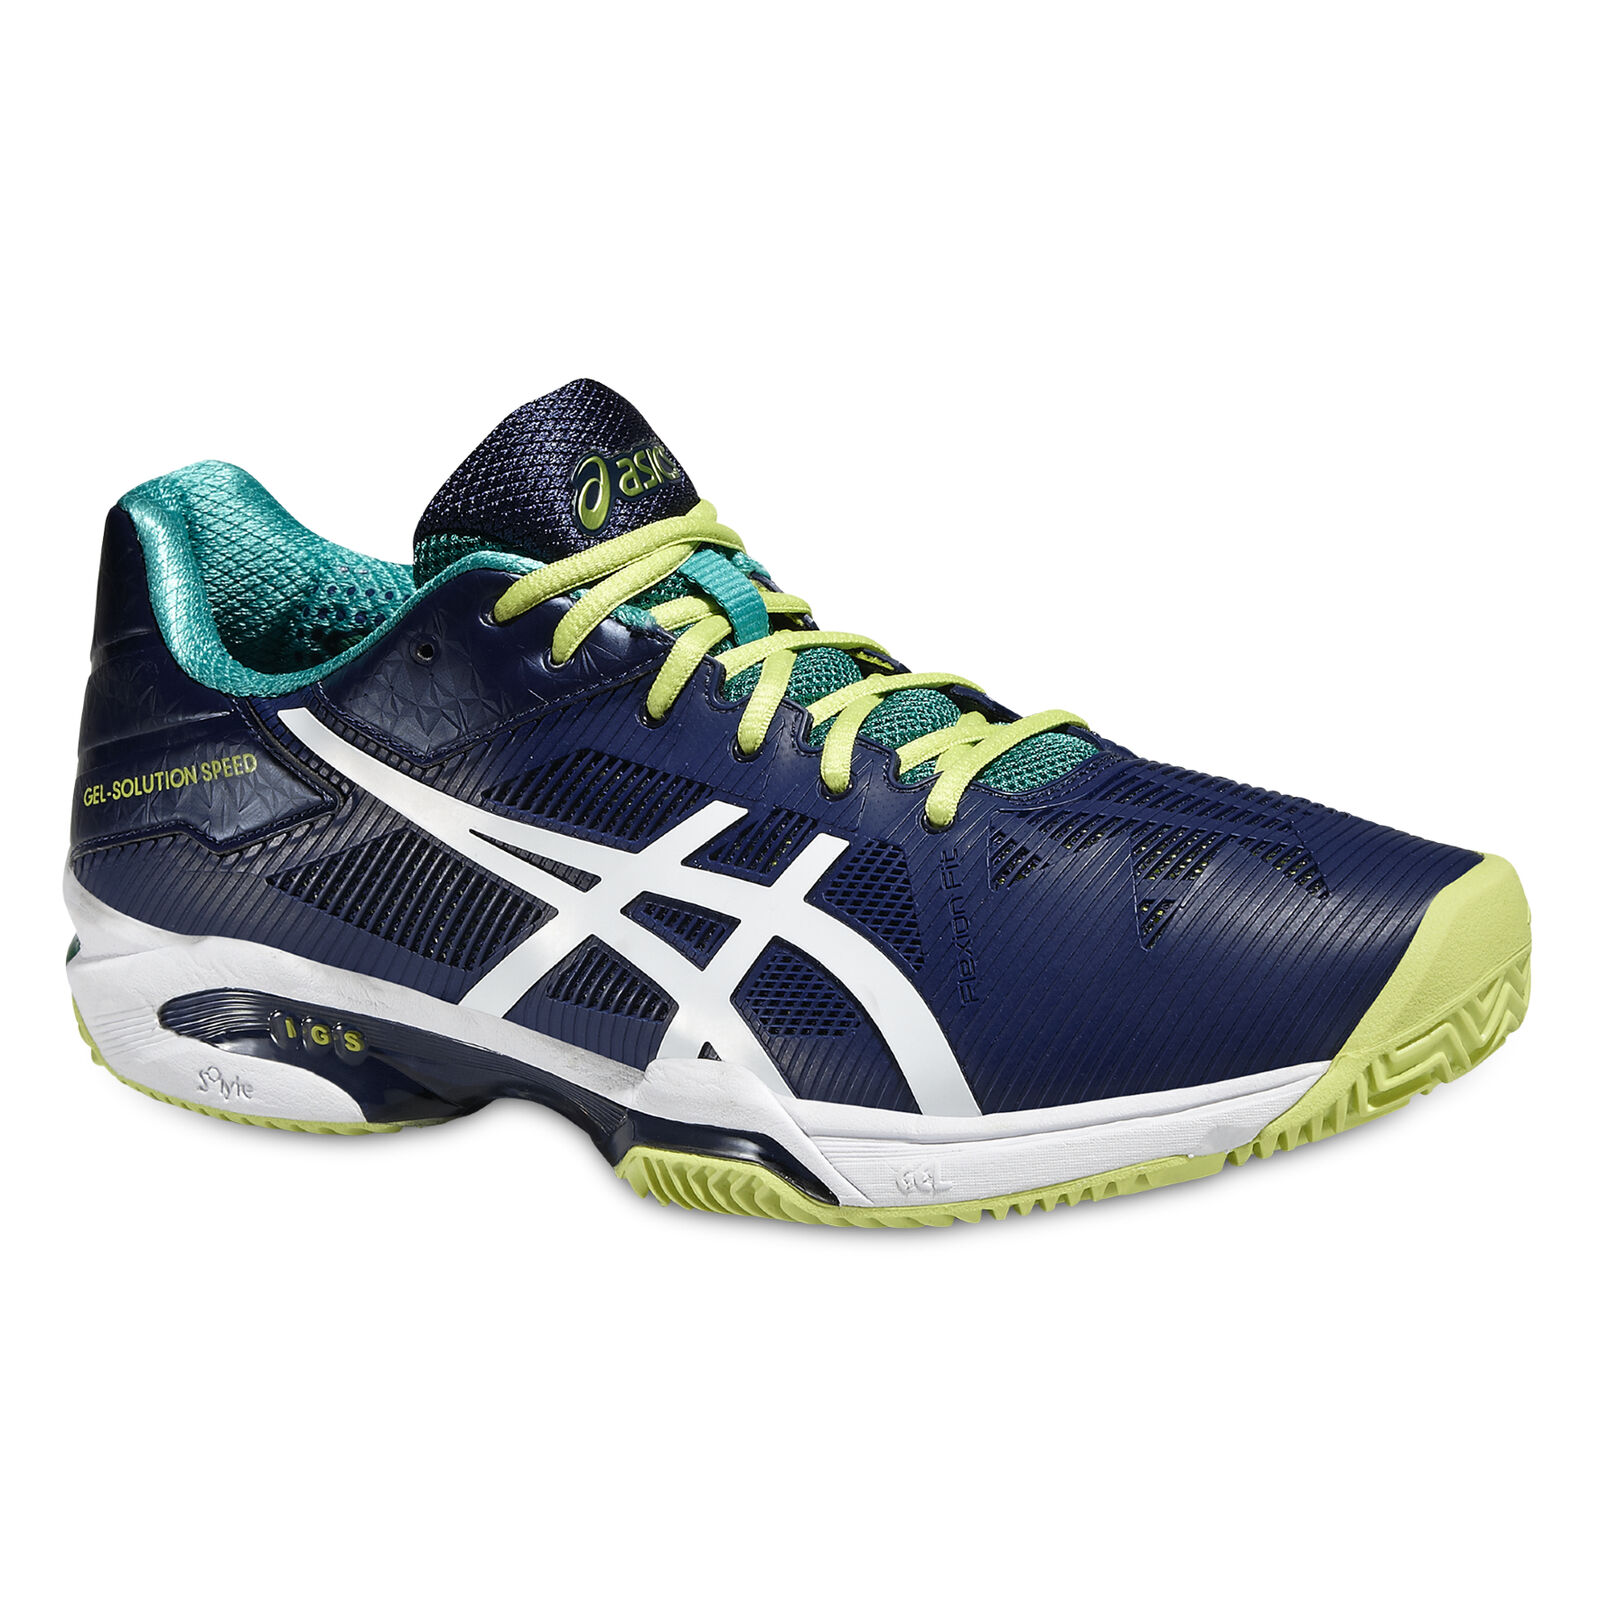 Asics Gel-solution Speed 3 Clay-Tennis Hommes Chaussures-e601n-5001 Chaussures-e601n-5001 Chaussures-e601n-5001 fecbe6